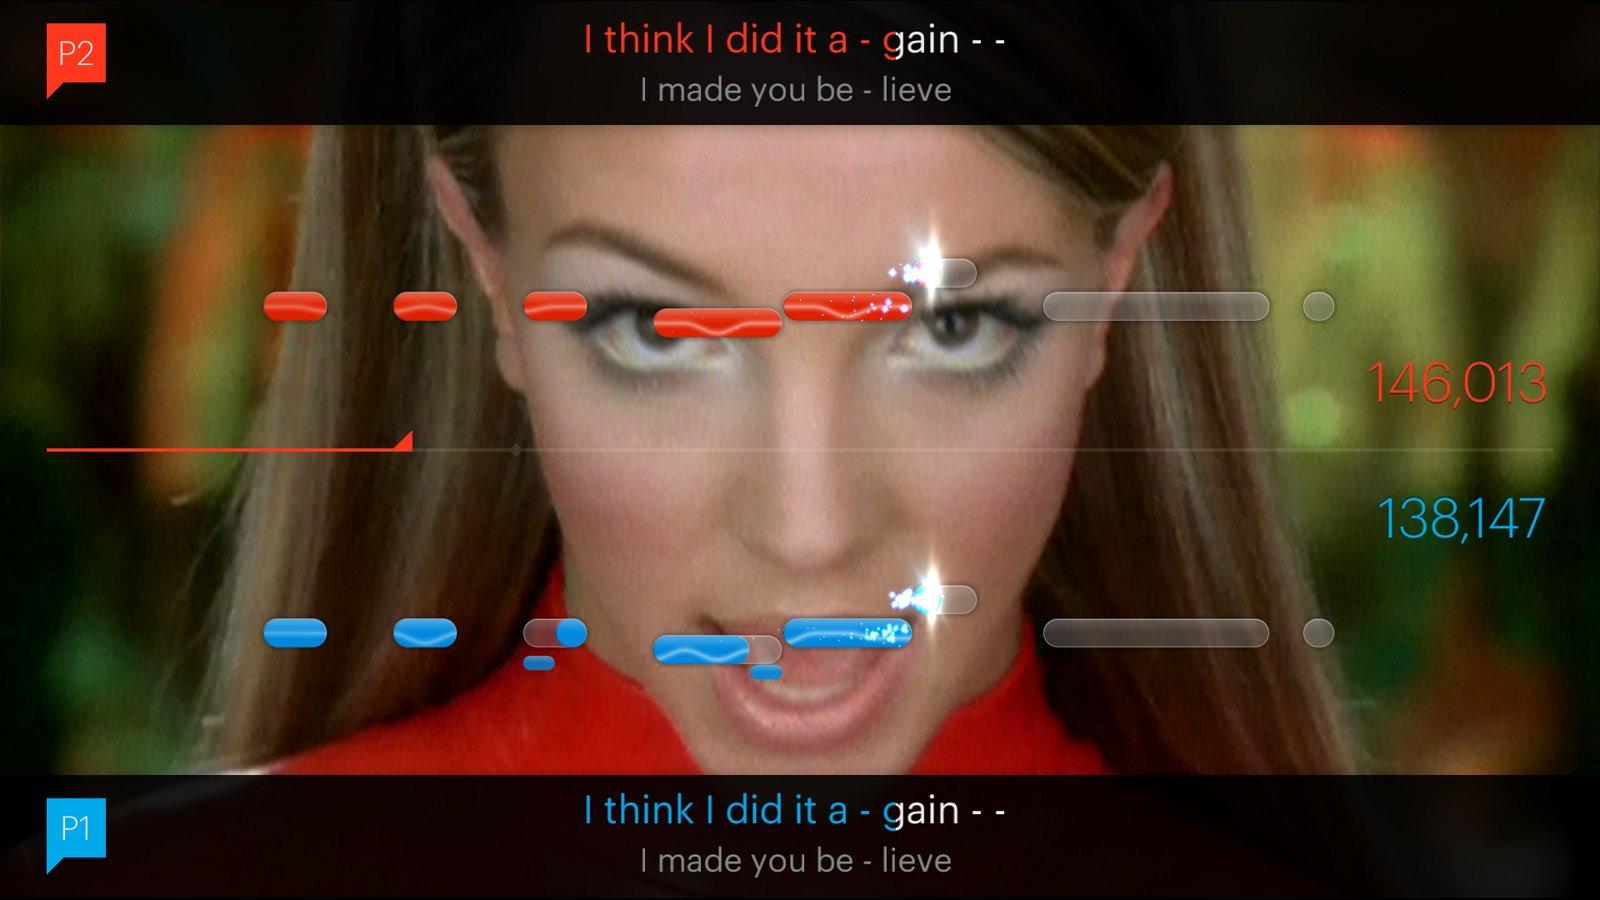 Hum... Oui, cest Britney Spears.